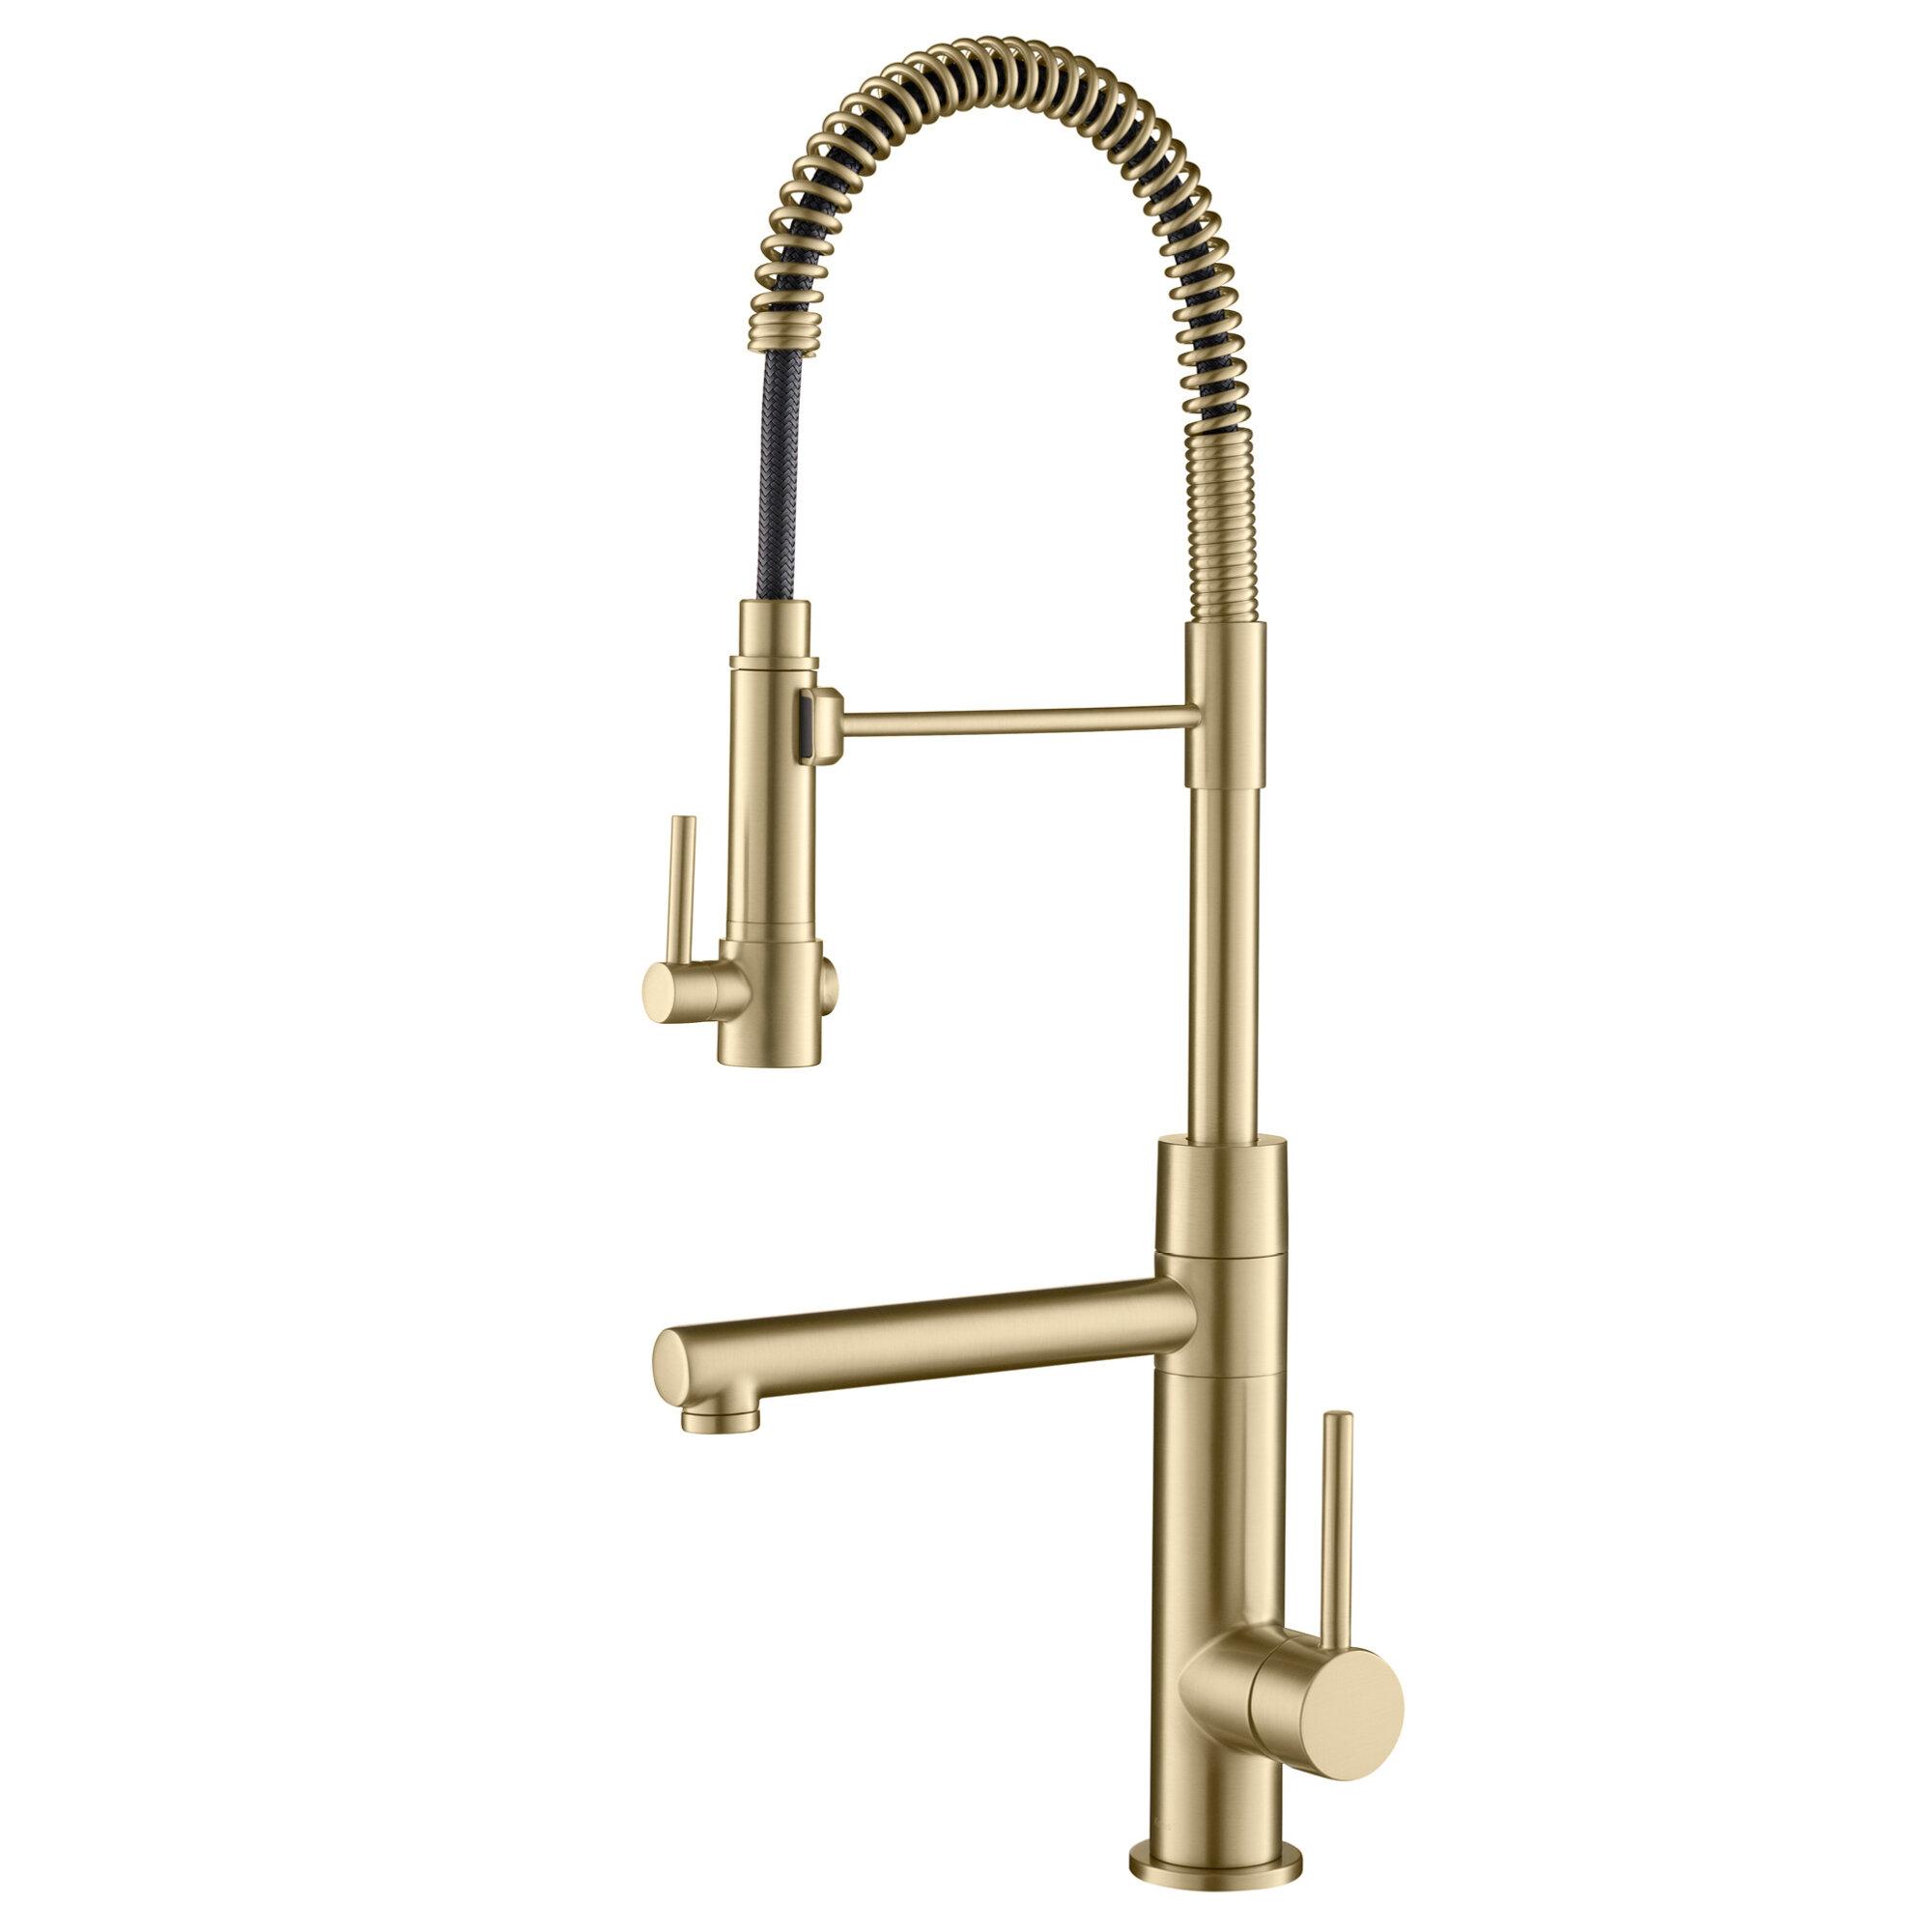 Artec Pro Pull Down Single Handle Kitchen Faucet